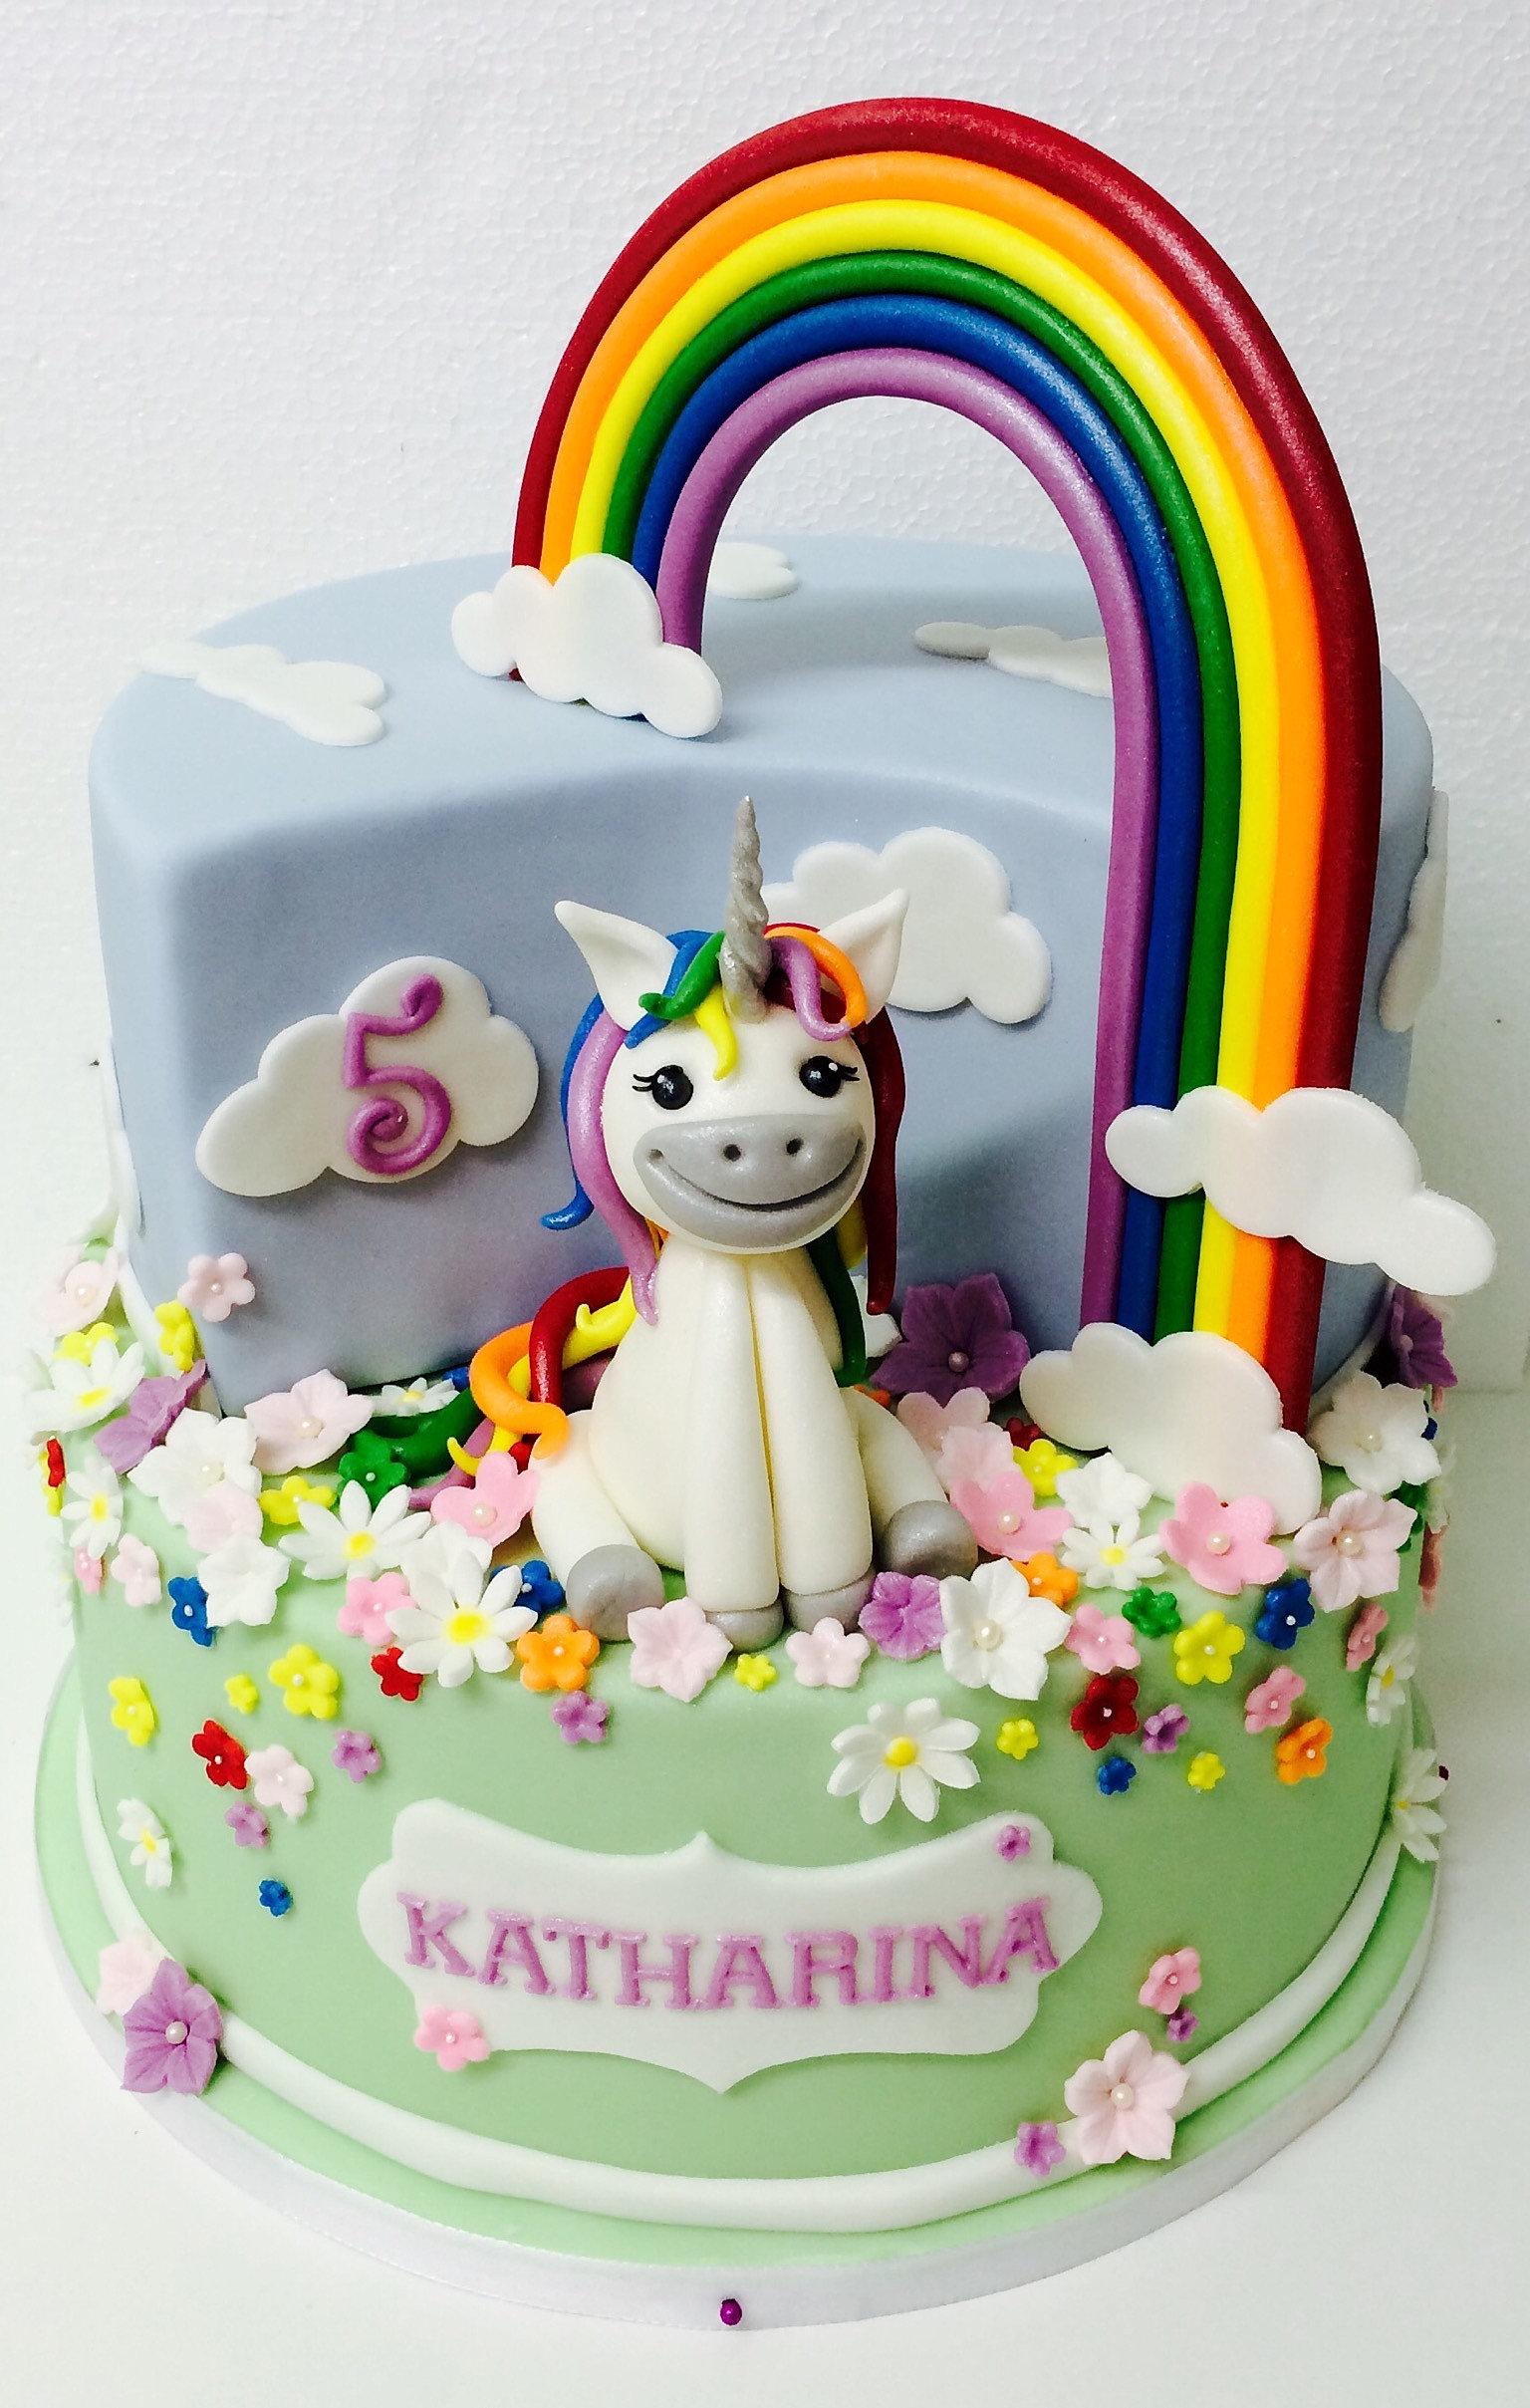 A Unicorn Cake